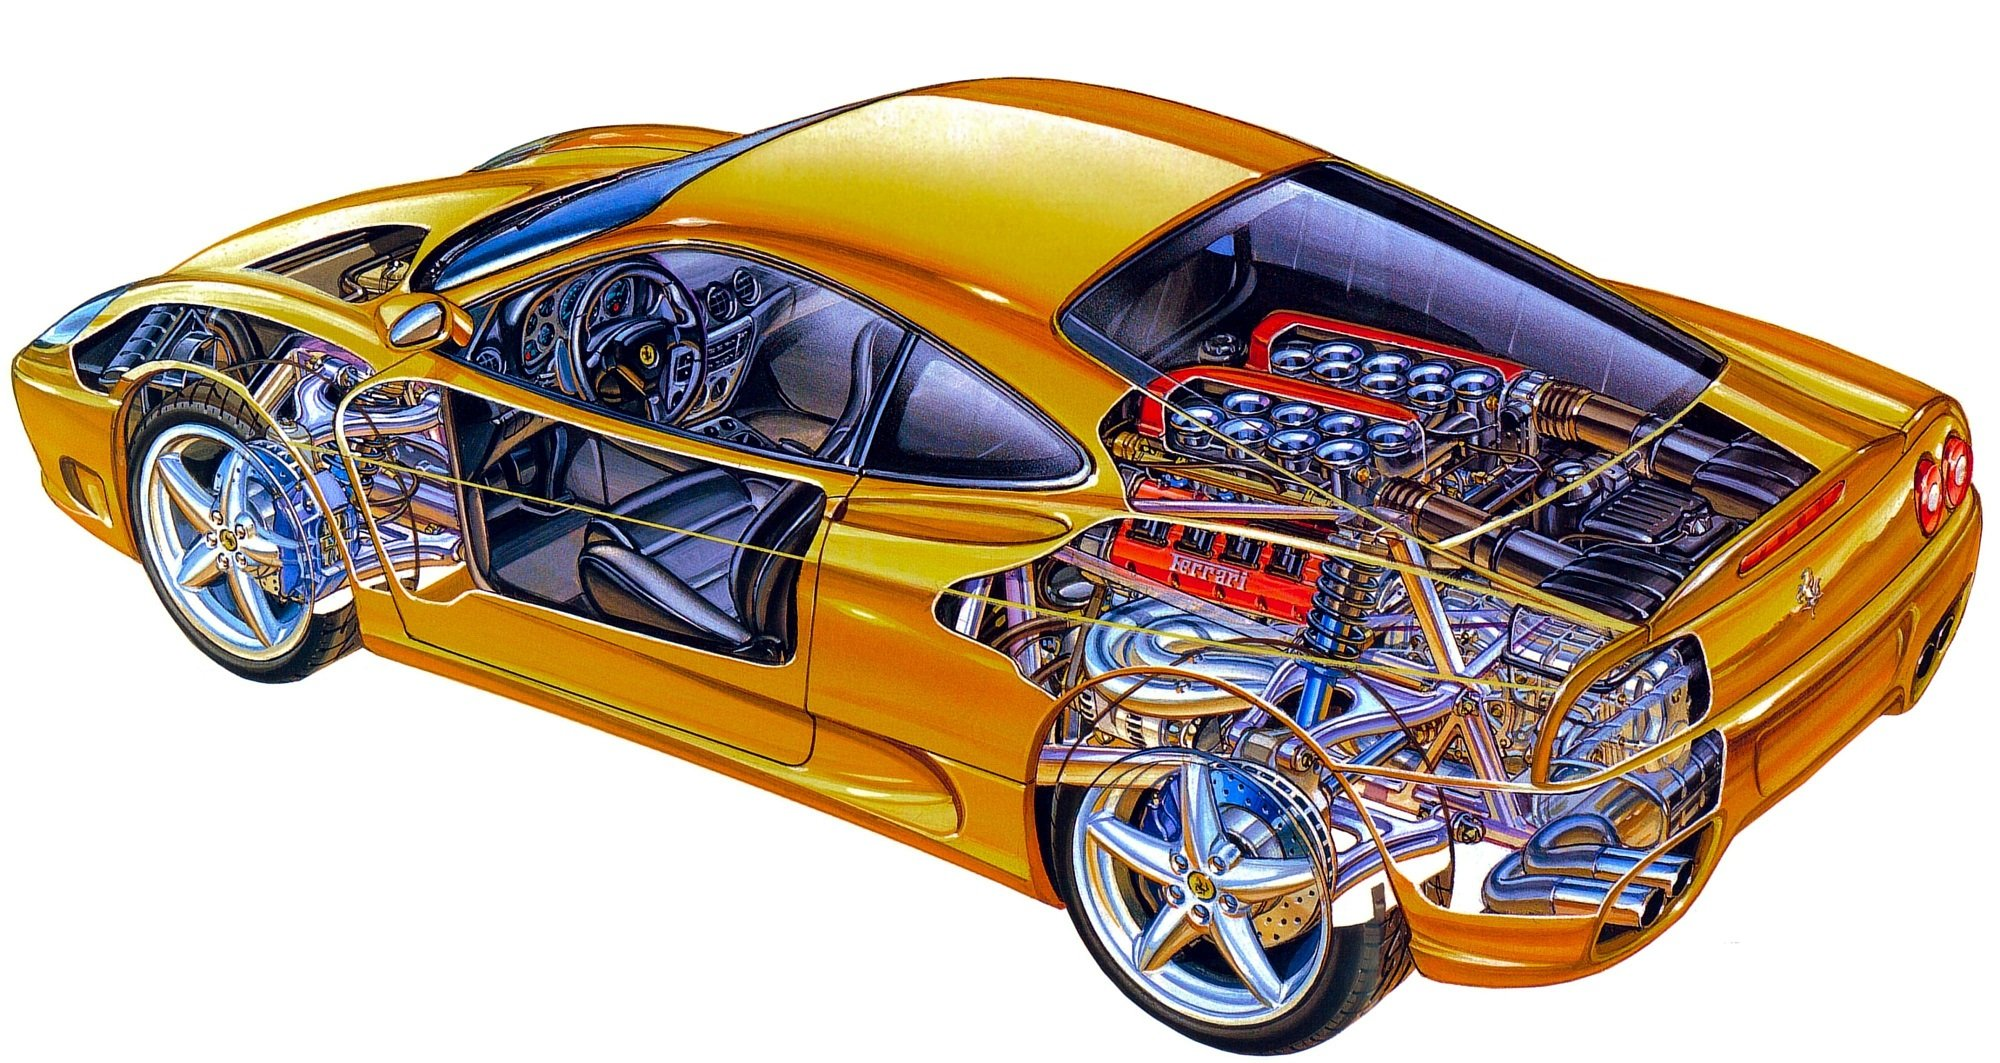 Ferrari 360 Modena Cars Technical Cutaway Wallpaper 2000x1063 689680 Wallpaperup